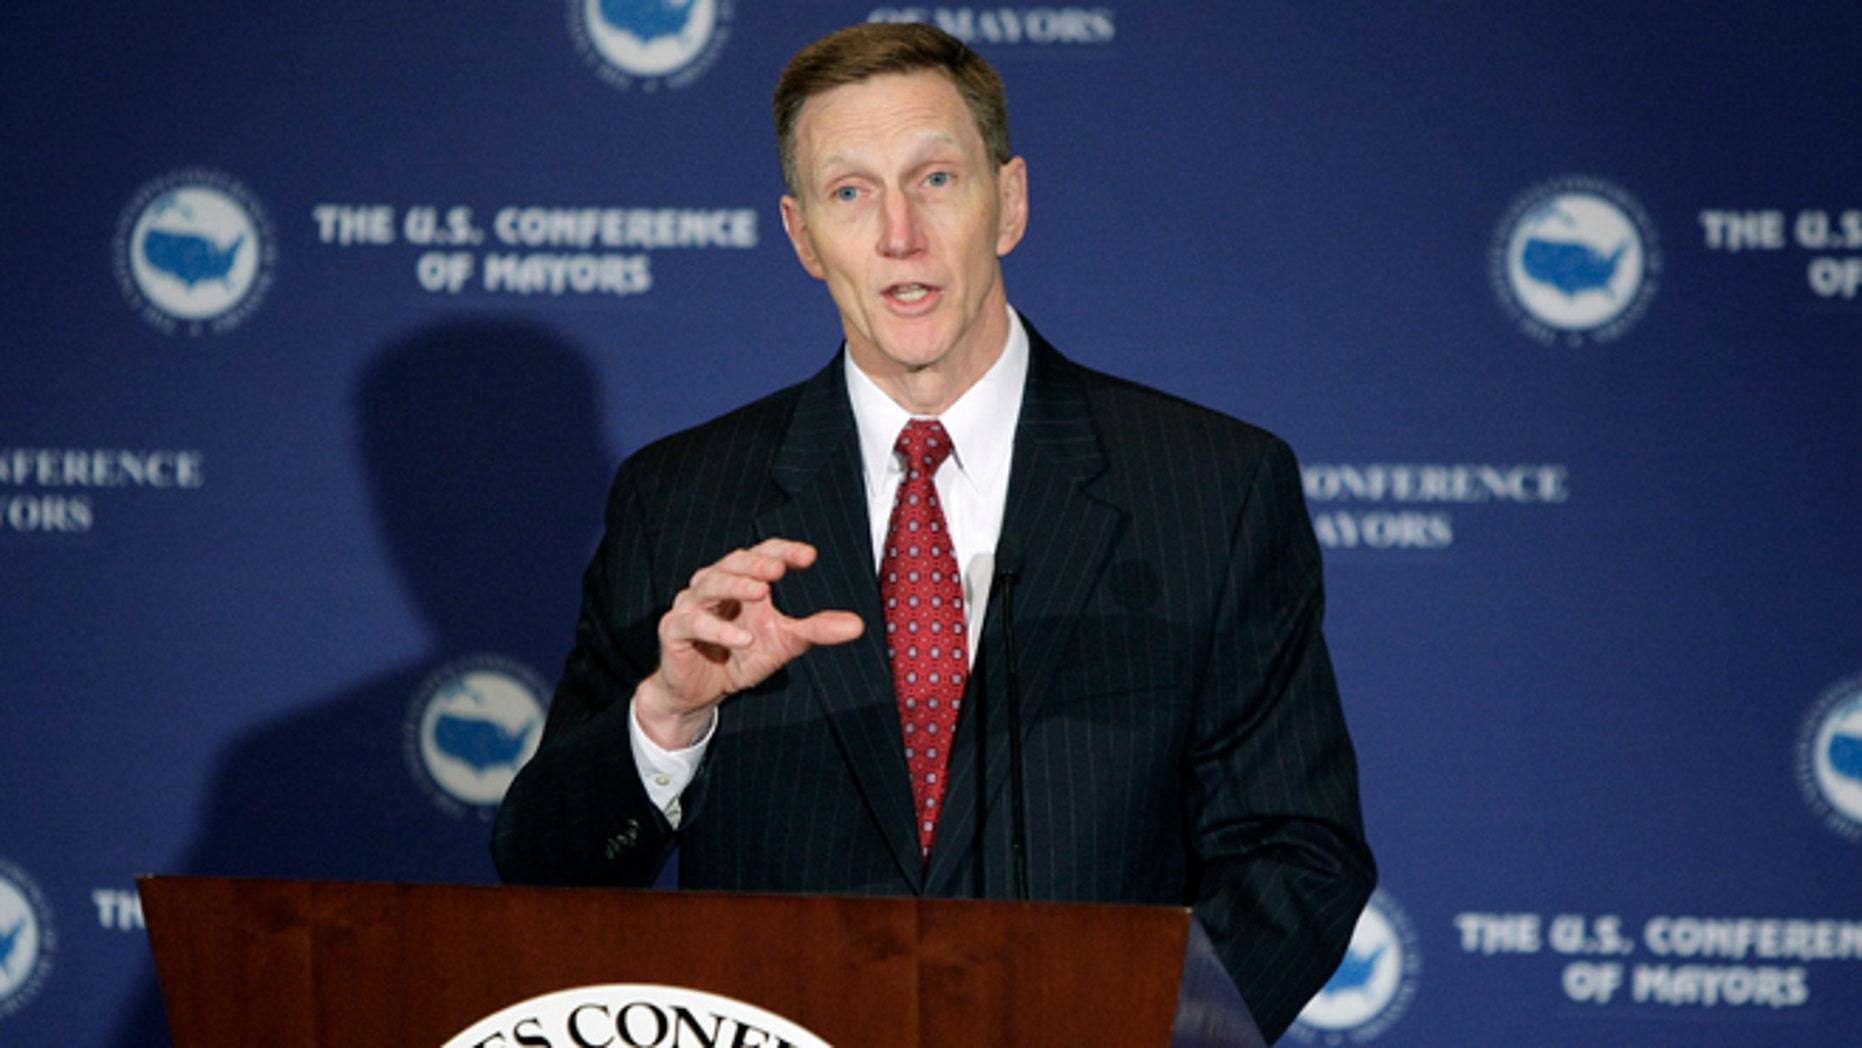 U.S. TSA Administrator John Pistole in Washington, January 18, 2013.